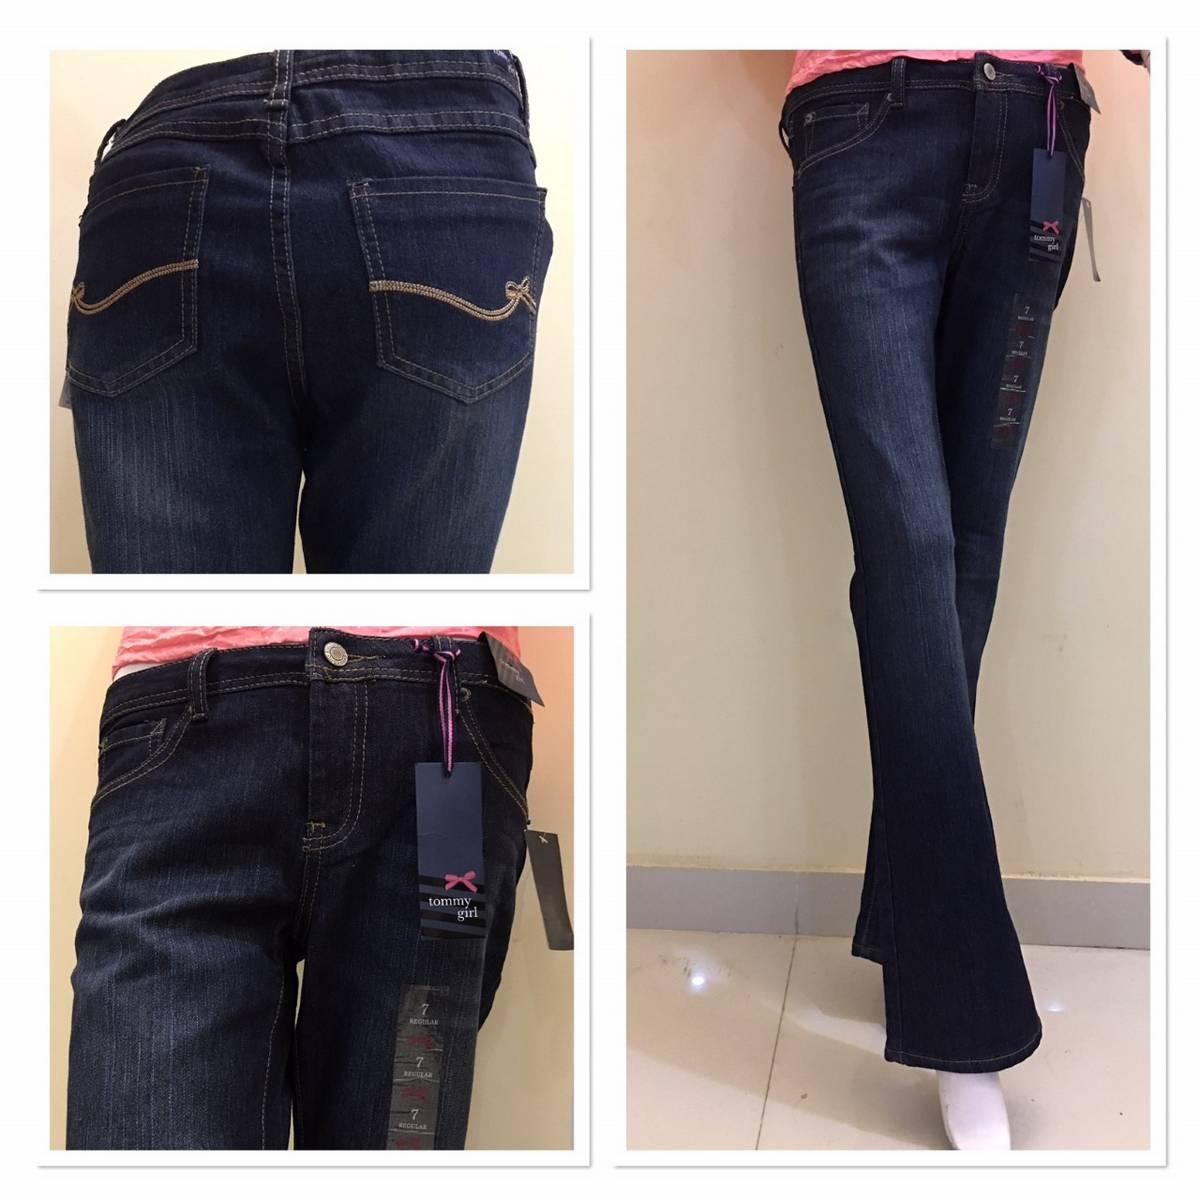 jeans for girls bell bottom style